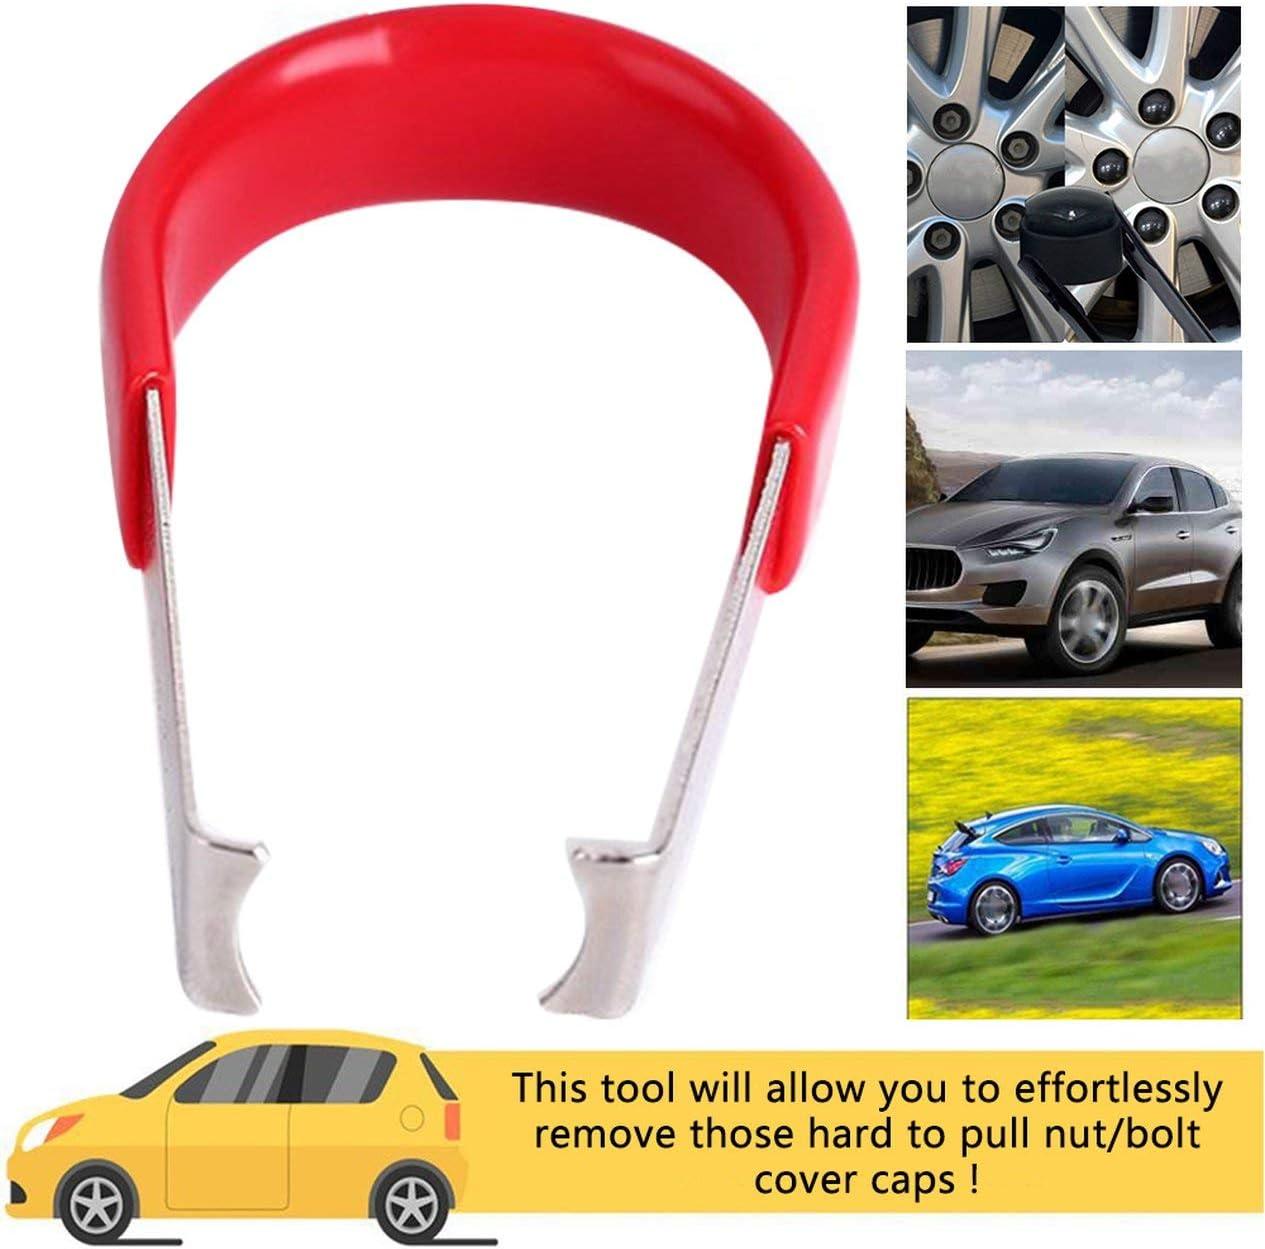 black BCVBFGCXVB Car Wheel Bolt Nut Caps Covers Puller Remover Tool Tweezers Puller Metal